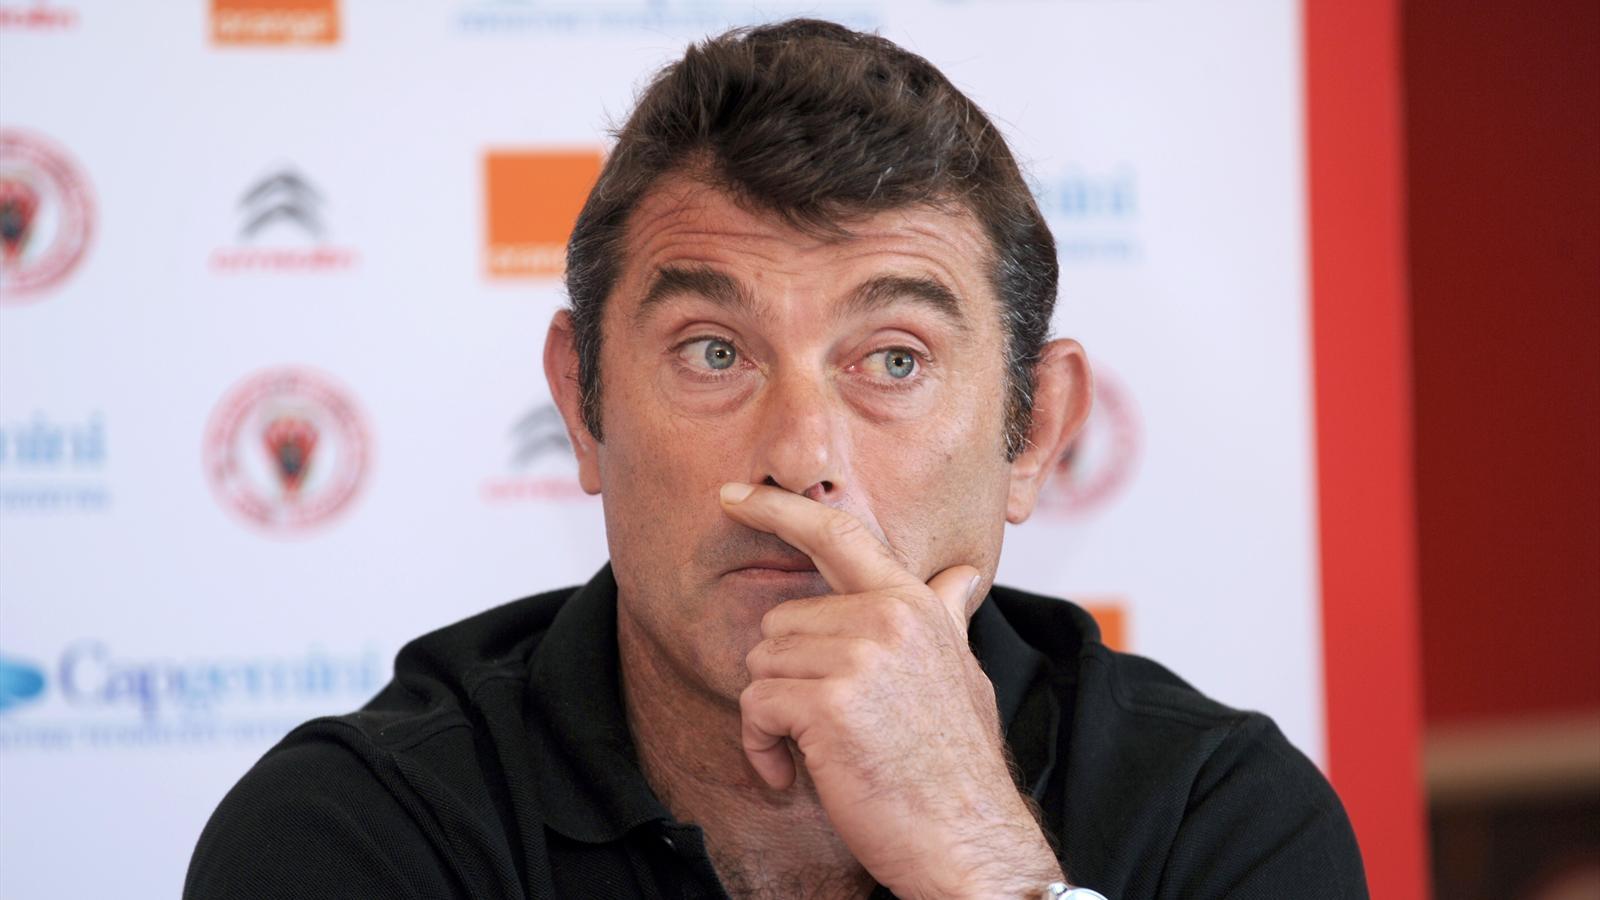 David Darriccarère (Biarritz)